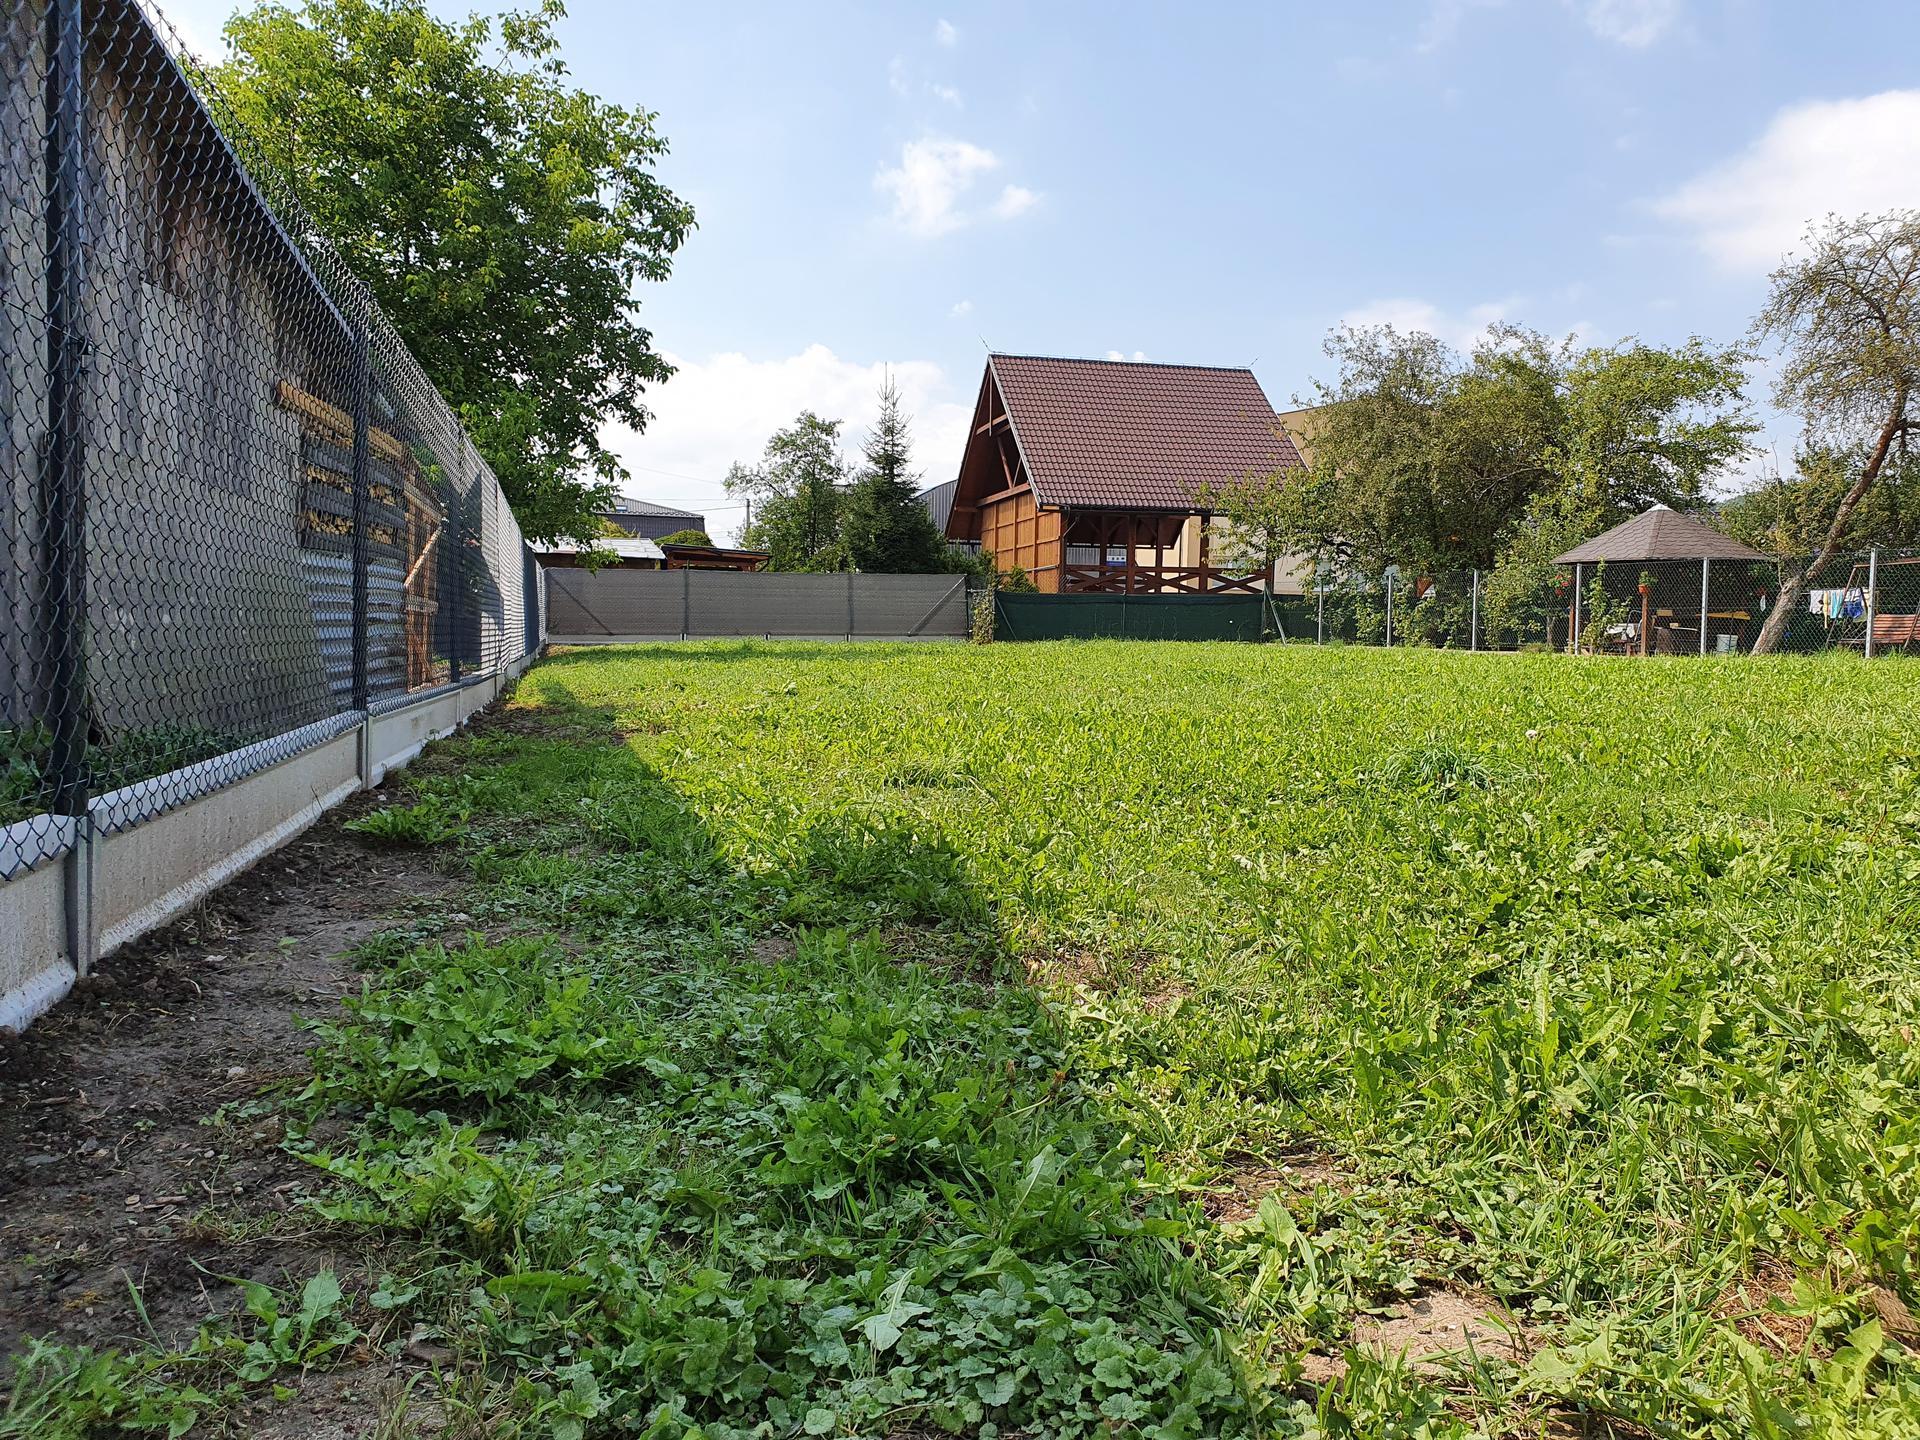 Rekonštrukcia domu-alebo chceme si splniť sen =》🏠🌻🌼🐶  mat domcek a vratit sa na Slovensko - novy plot od suseda :-)